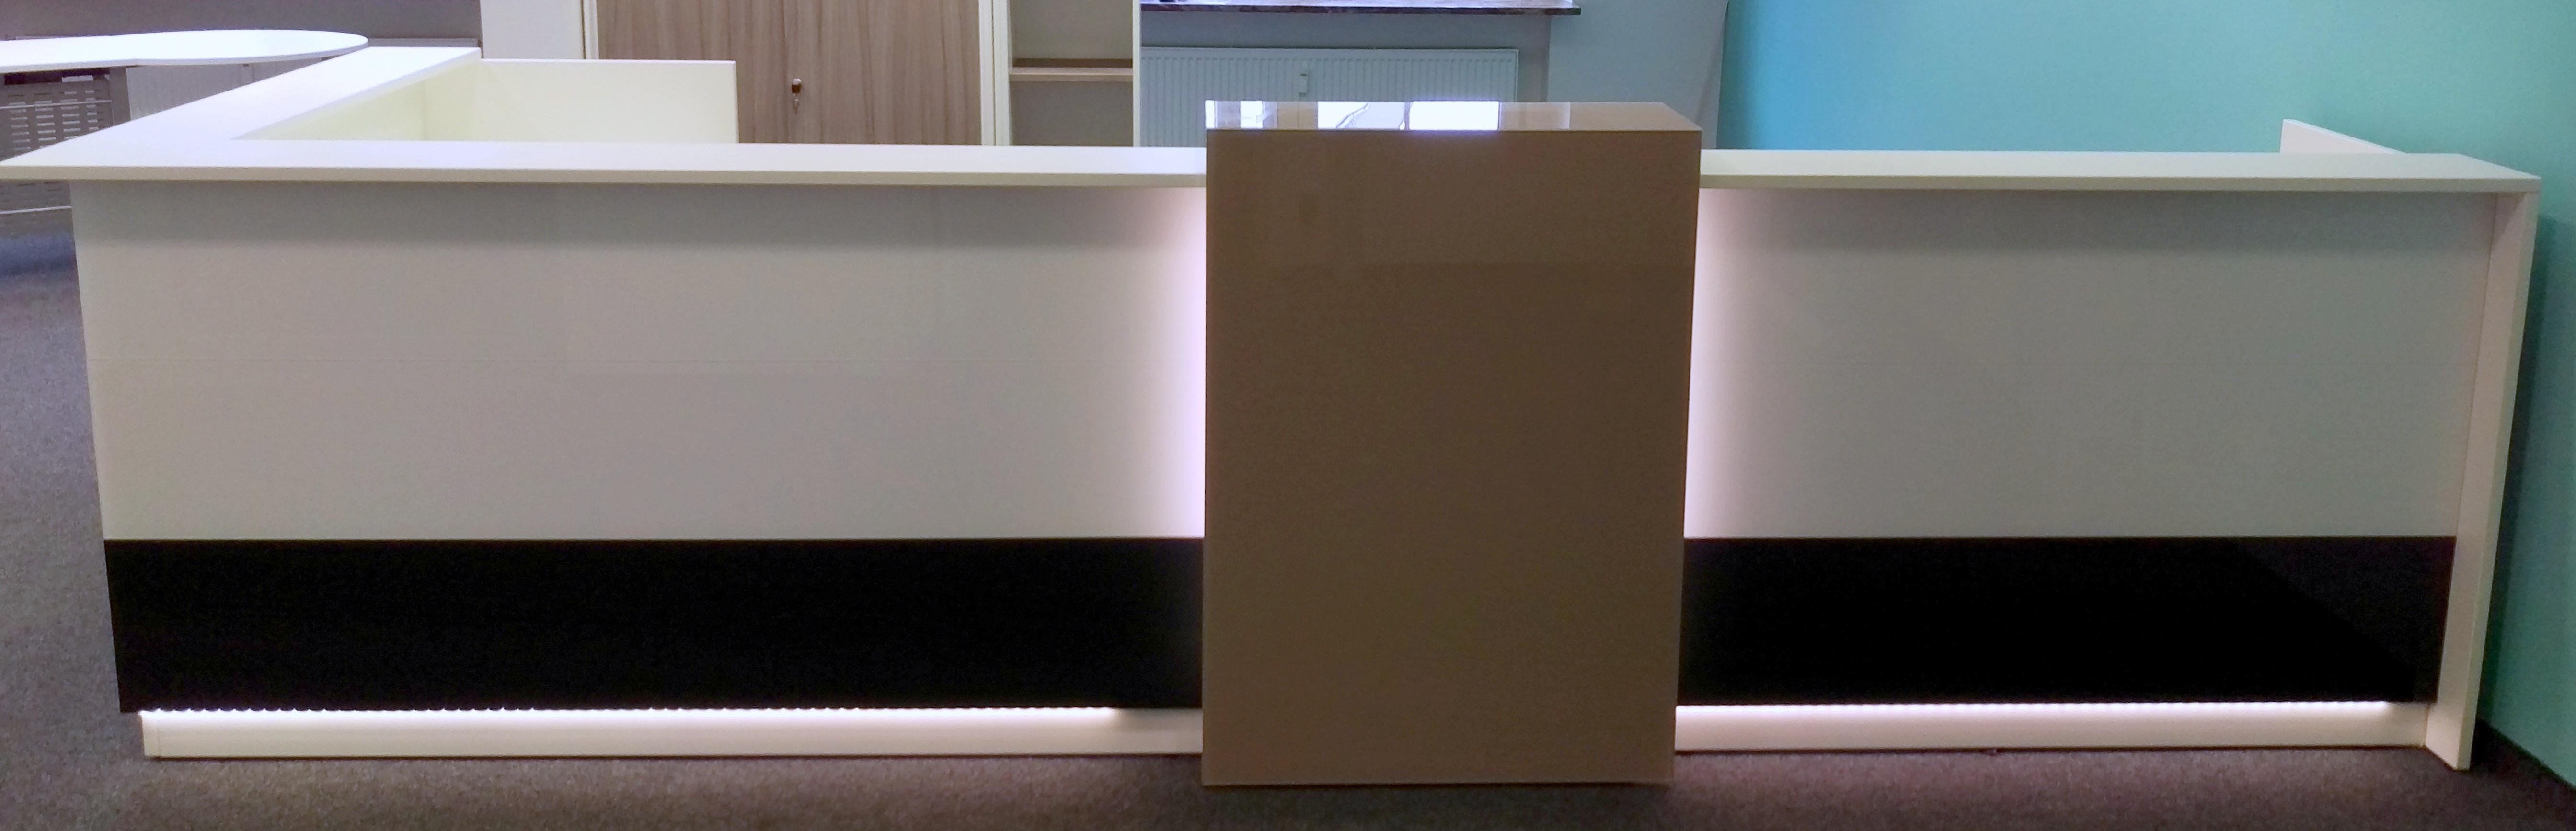 Febrü Empfangstheke 410 x 160 cm + Rollcontainer | GWV Büromöbel ...